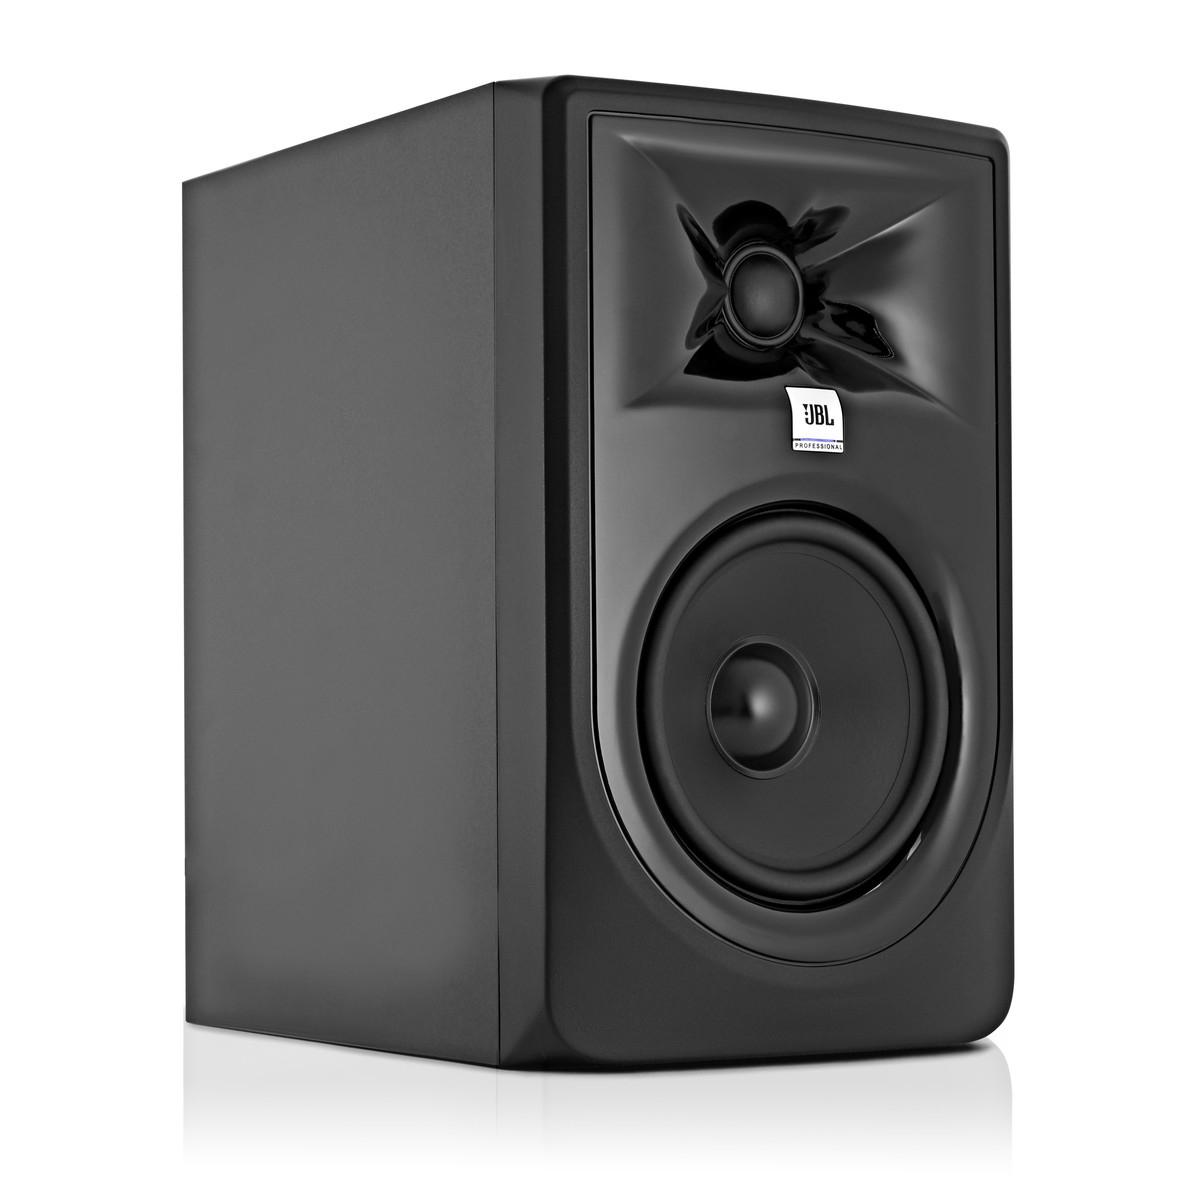 JBL 305p MKII Studio Monitor £99  Gear4music